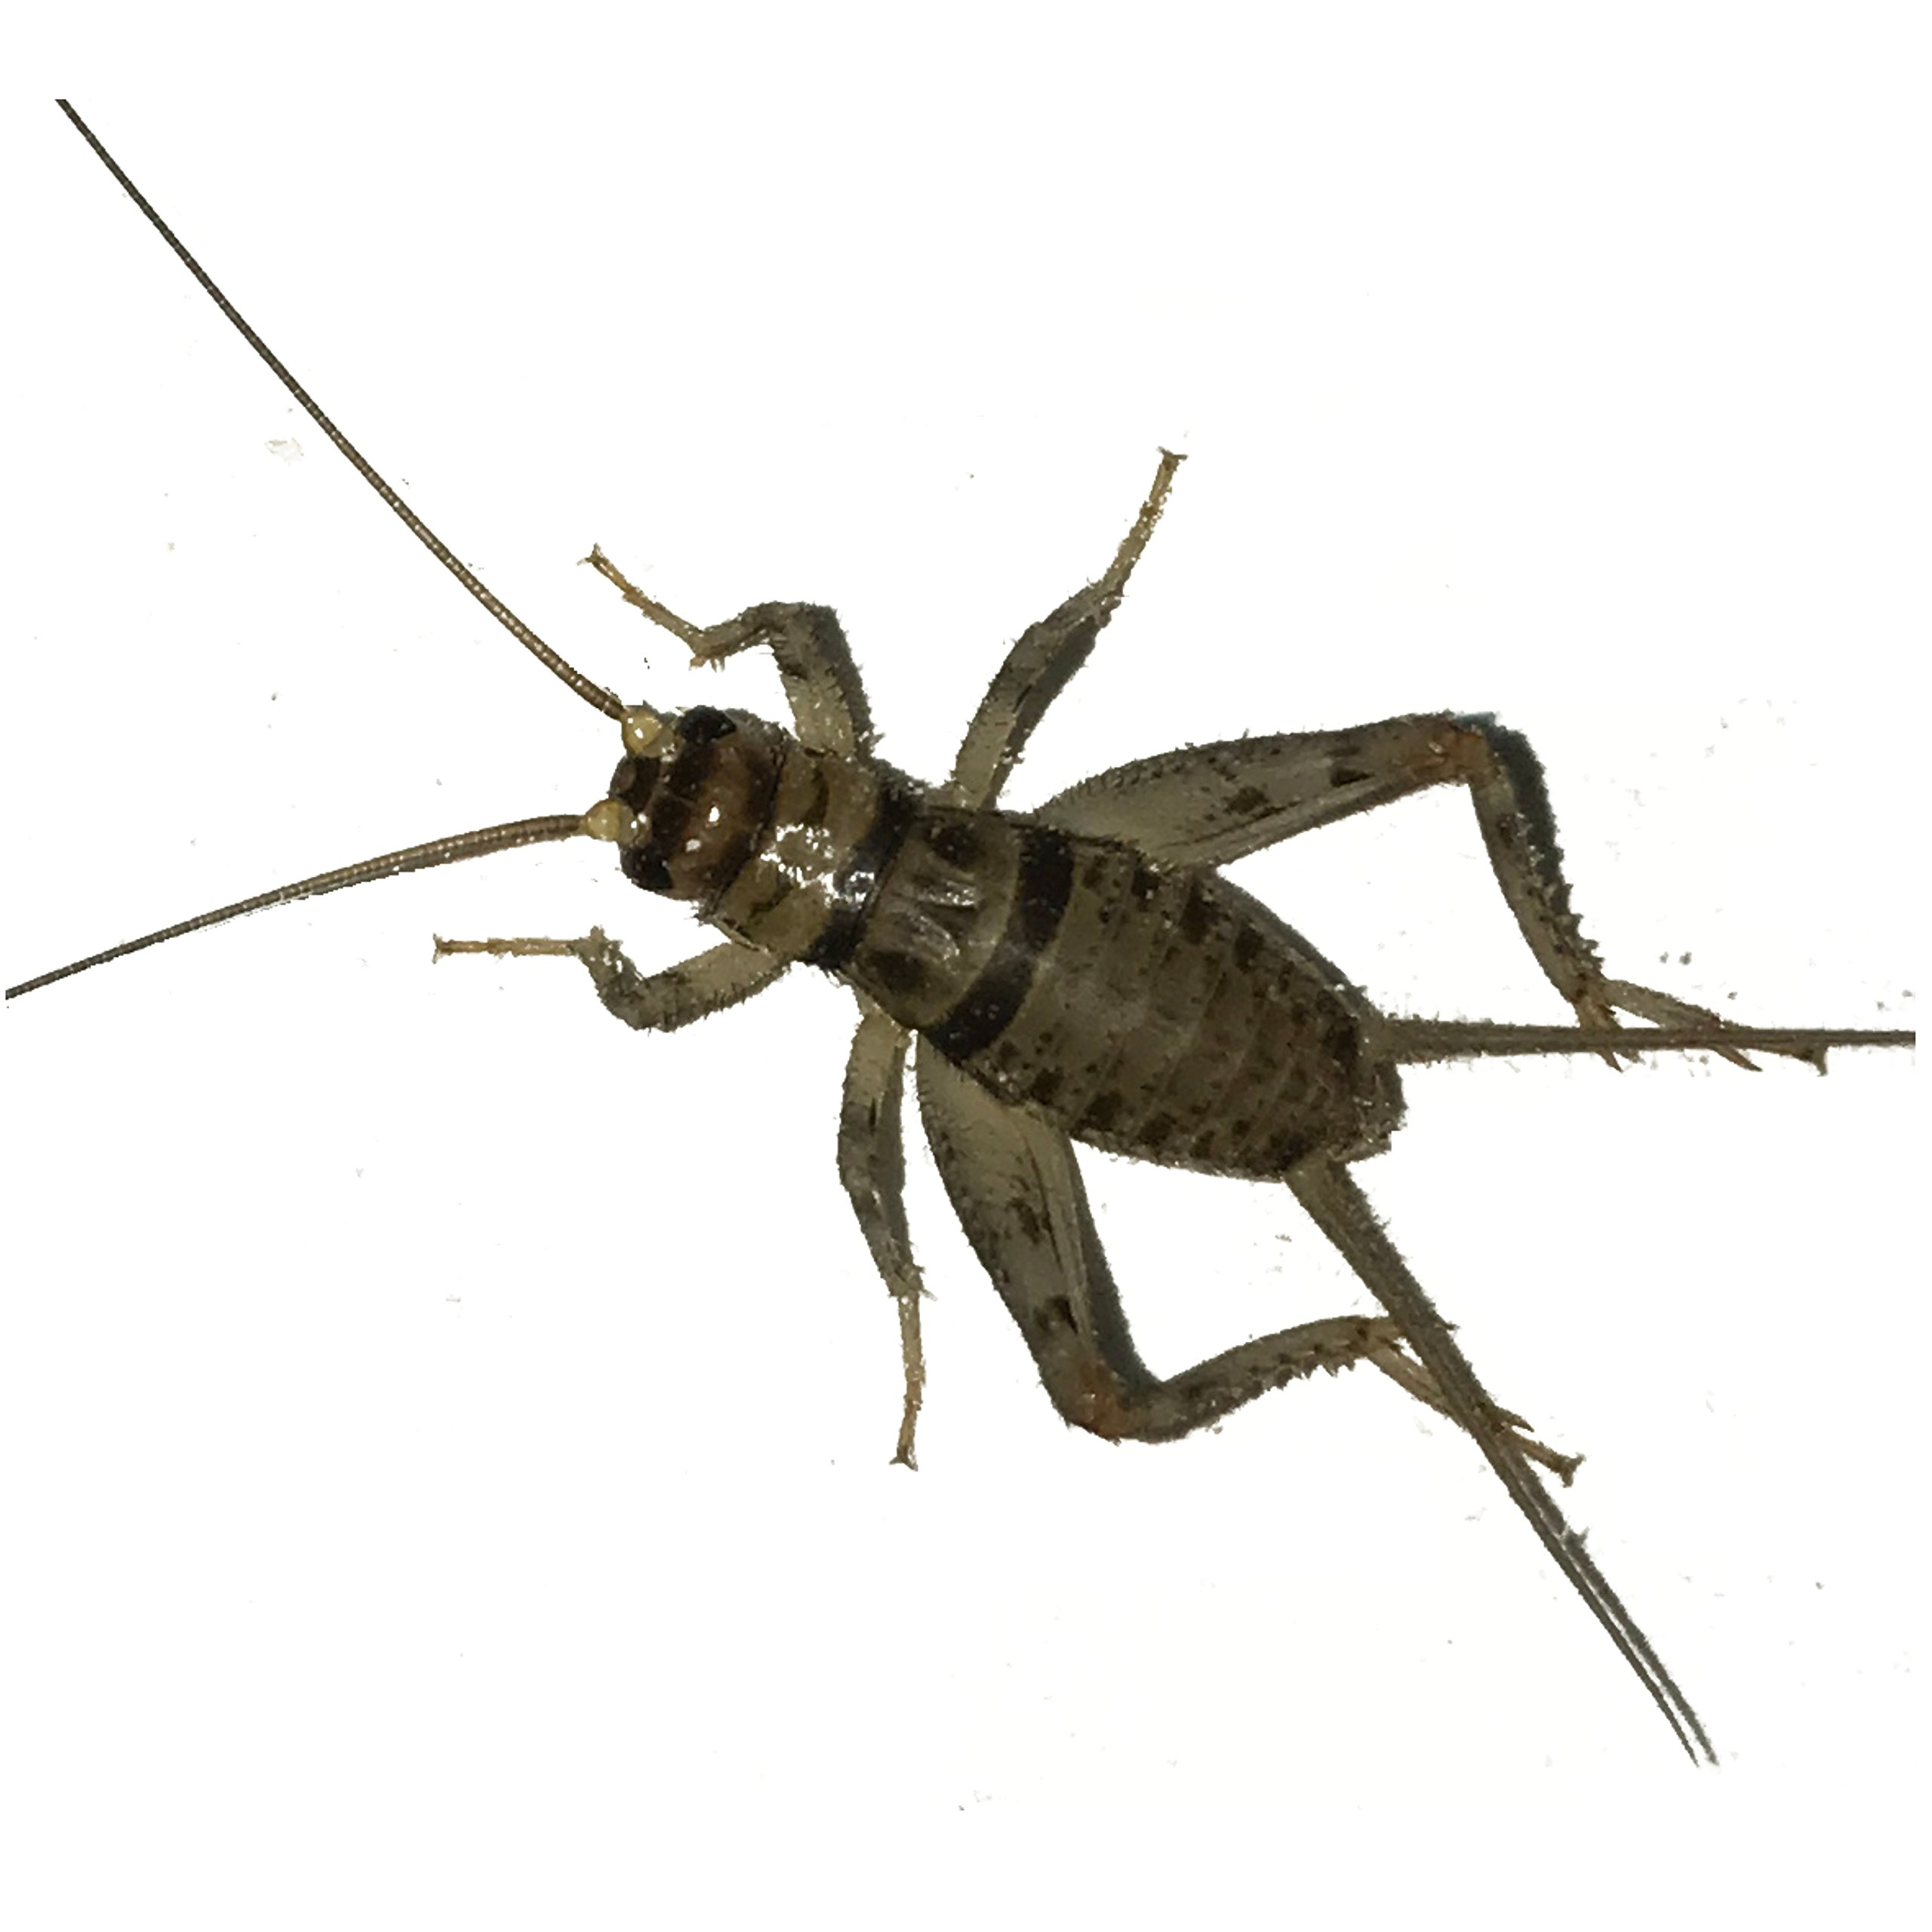 "100 Live Banded Crickets (Medium (1/2"")) by BuyFeederCrickets"